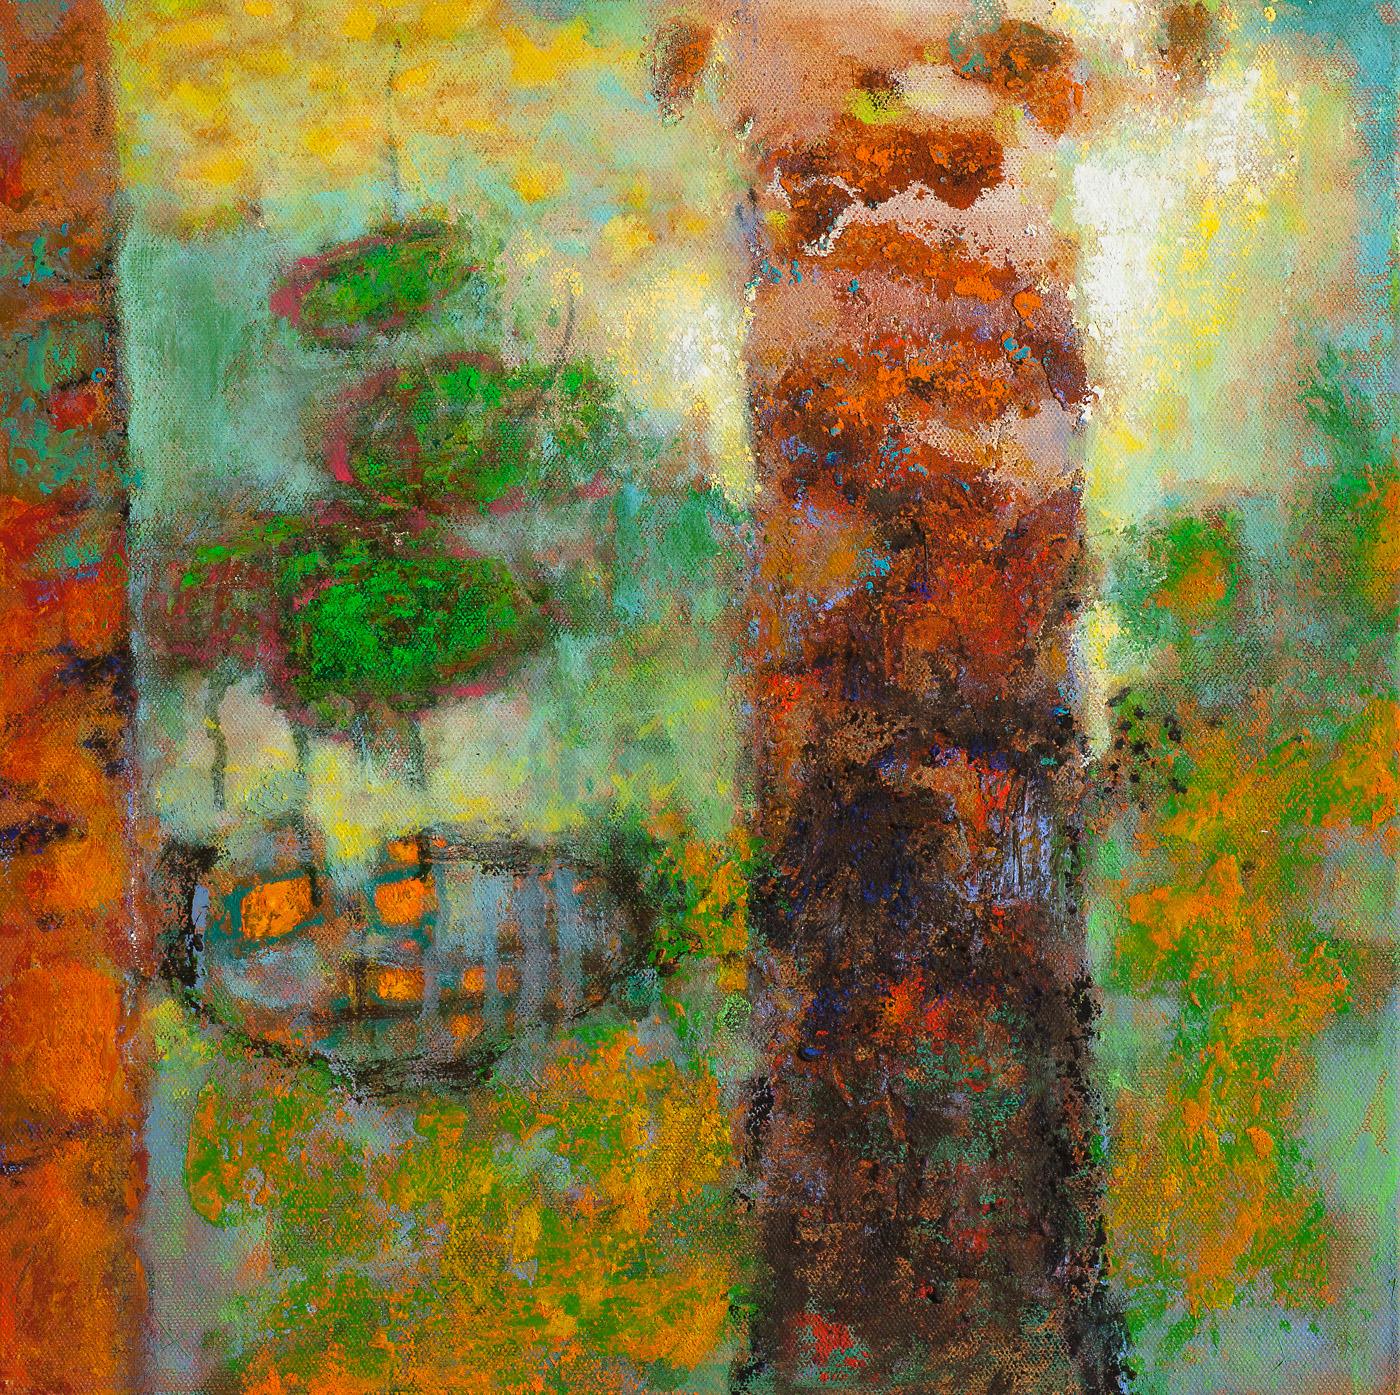 "Amazon Ceremony   | oil on canvas | 14 x 14"" | 2015  - SOLD"